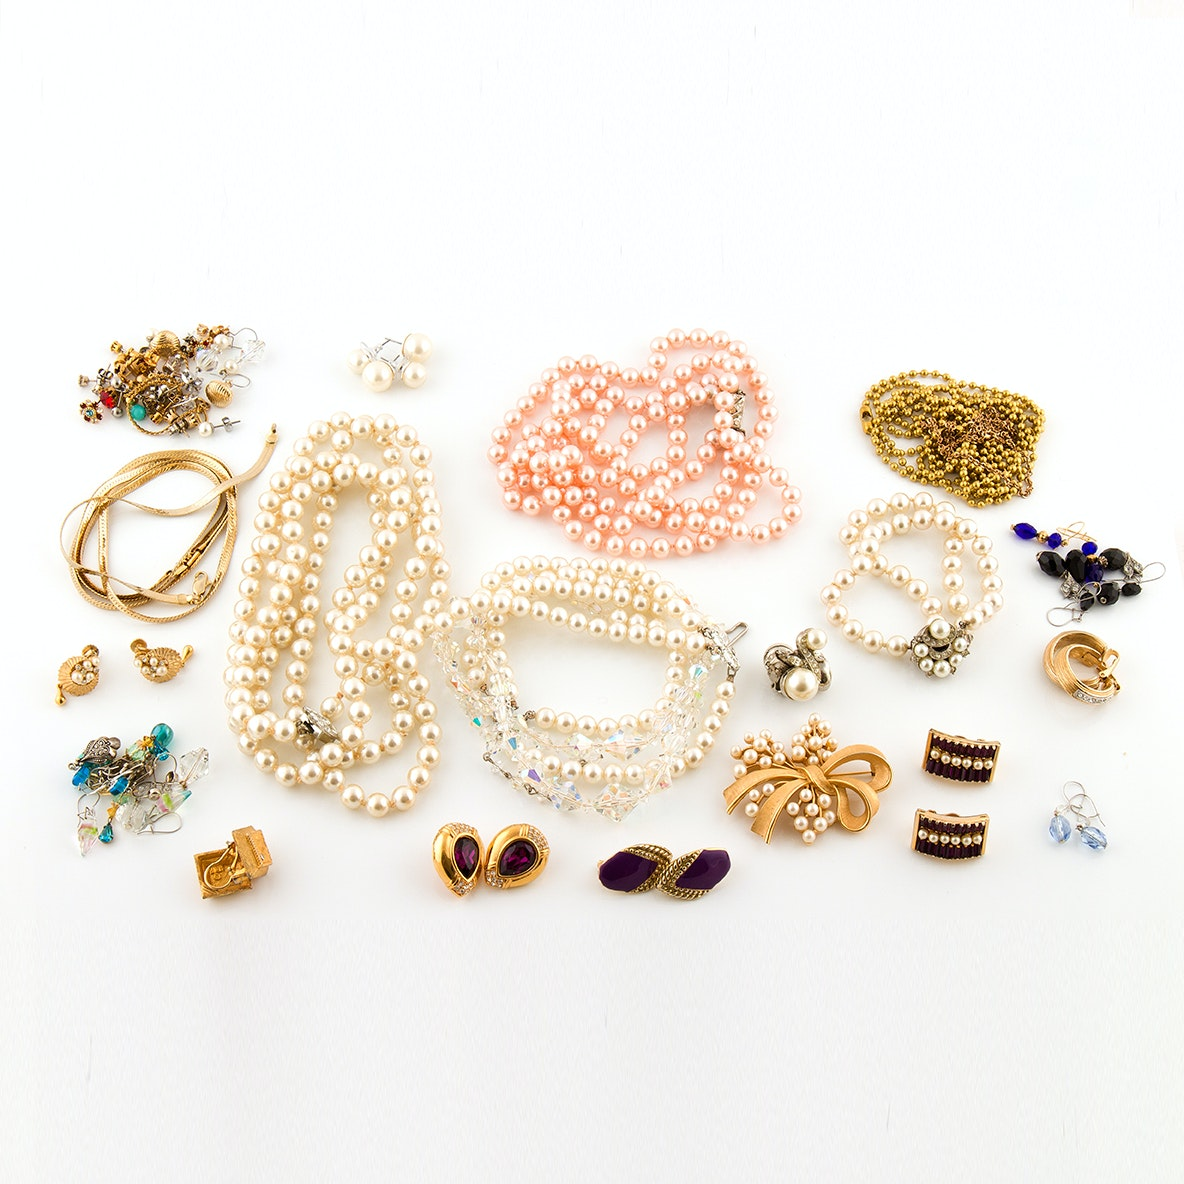 Vintage Imitation Pearl and Rhinestone Jewelry Featuring Crown Trifari